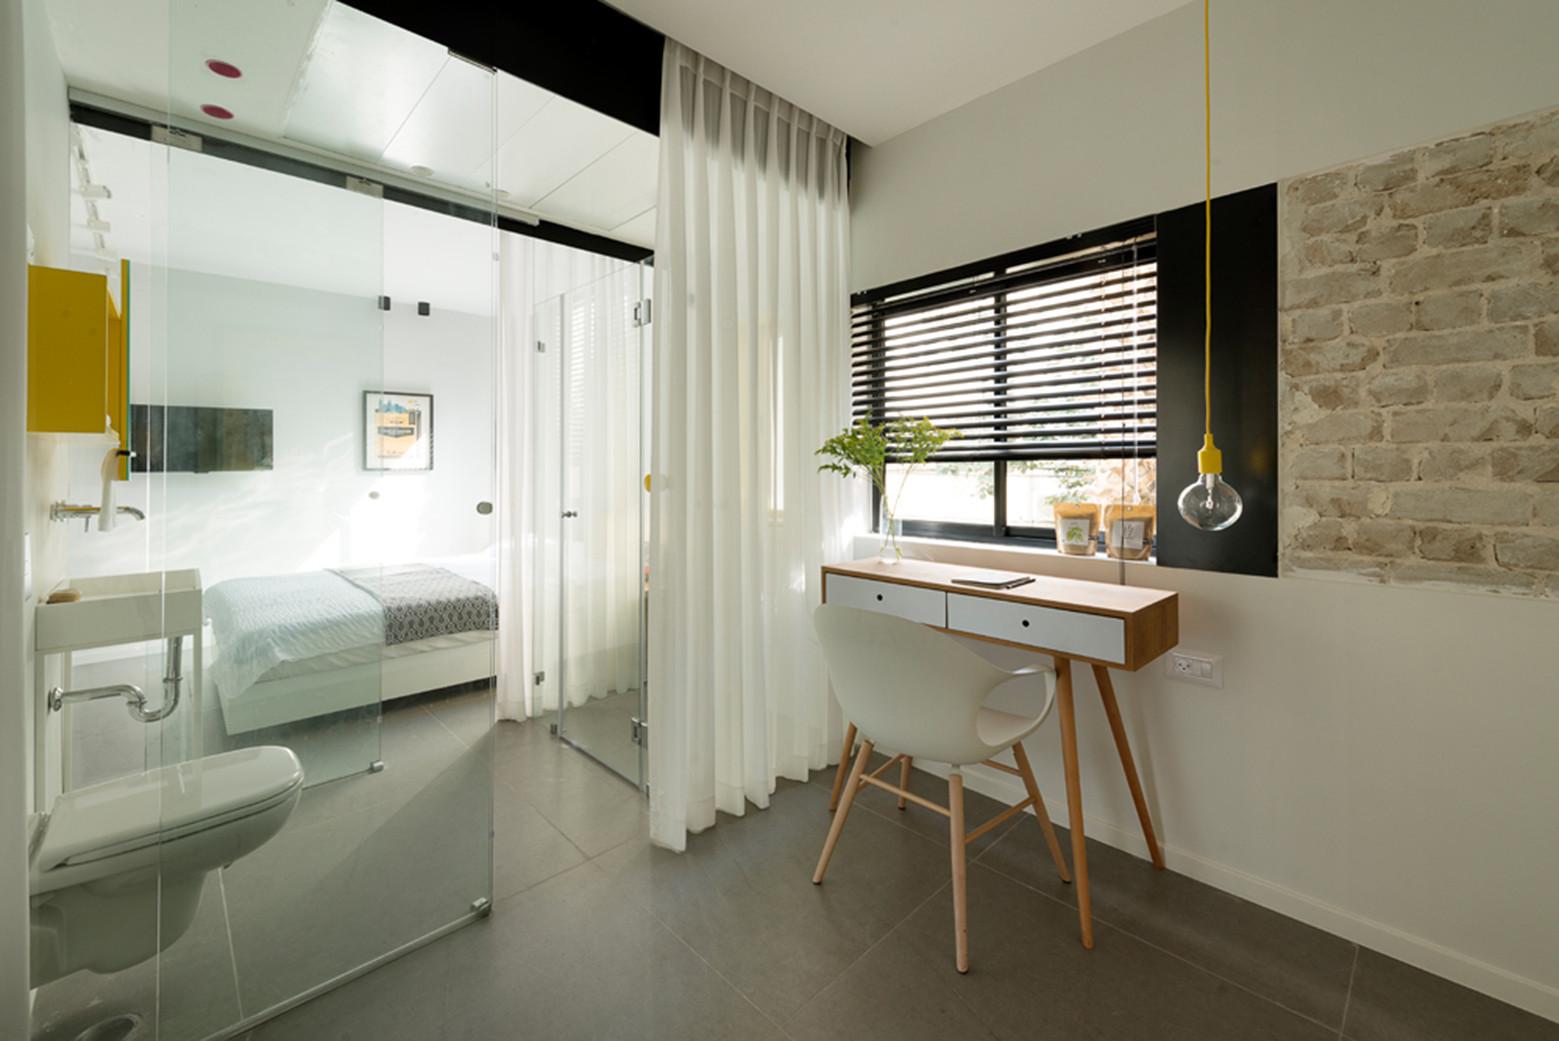 Gallery of Apartment in Tel Aviv  Amir NavonStudio 6B